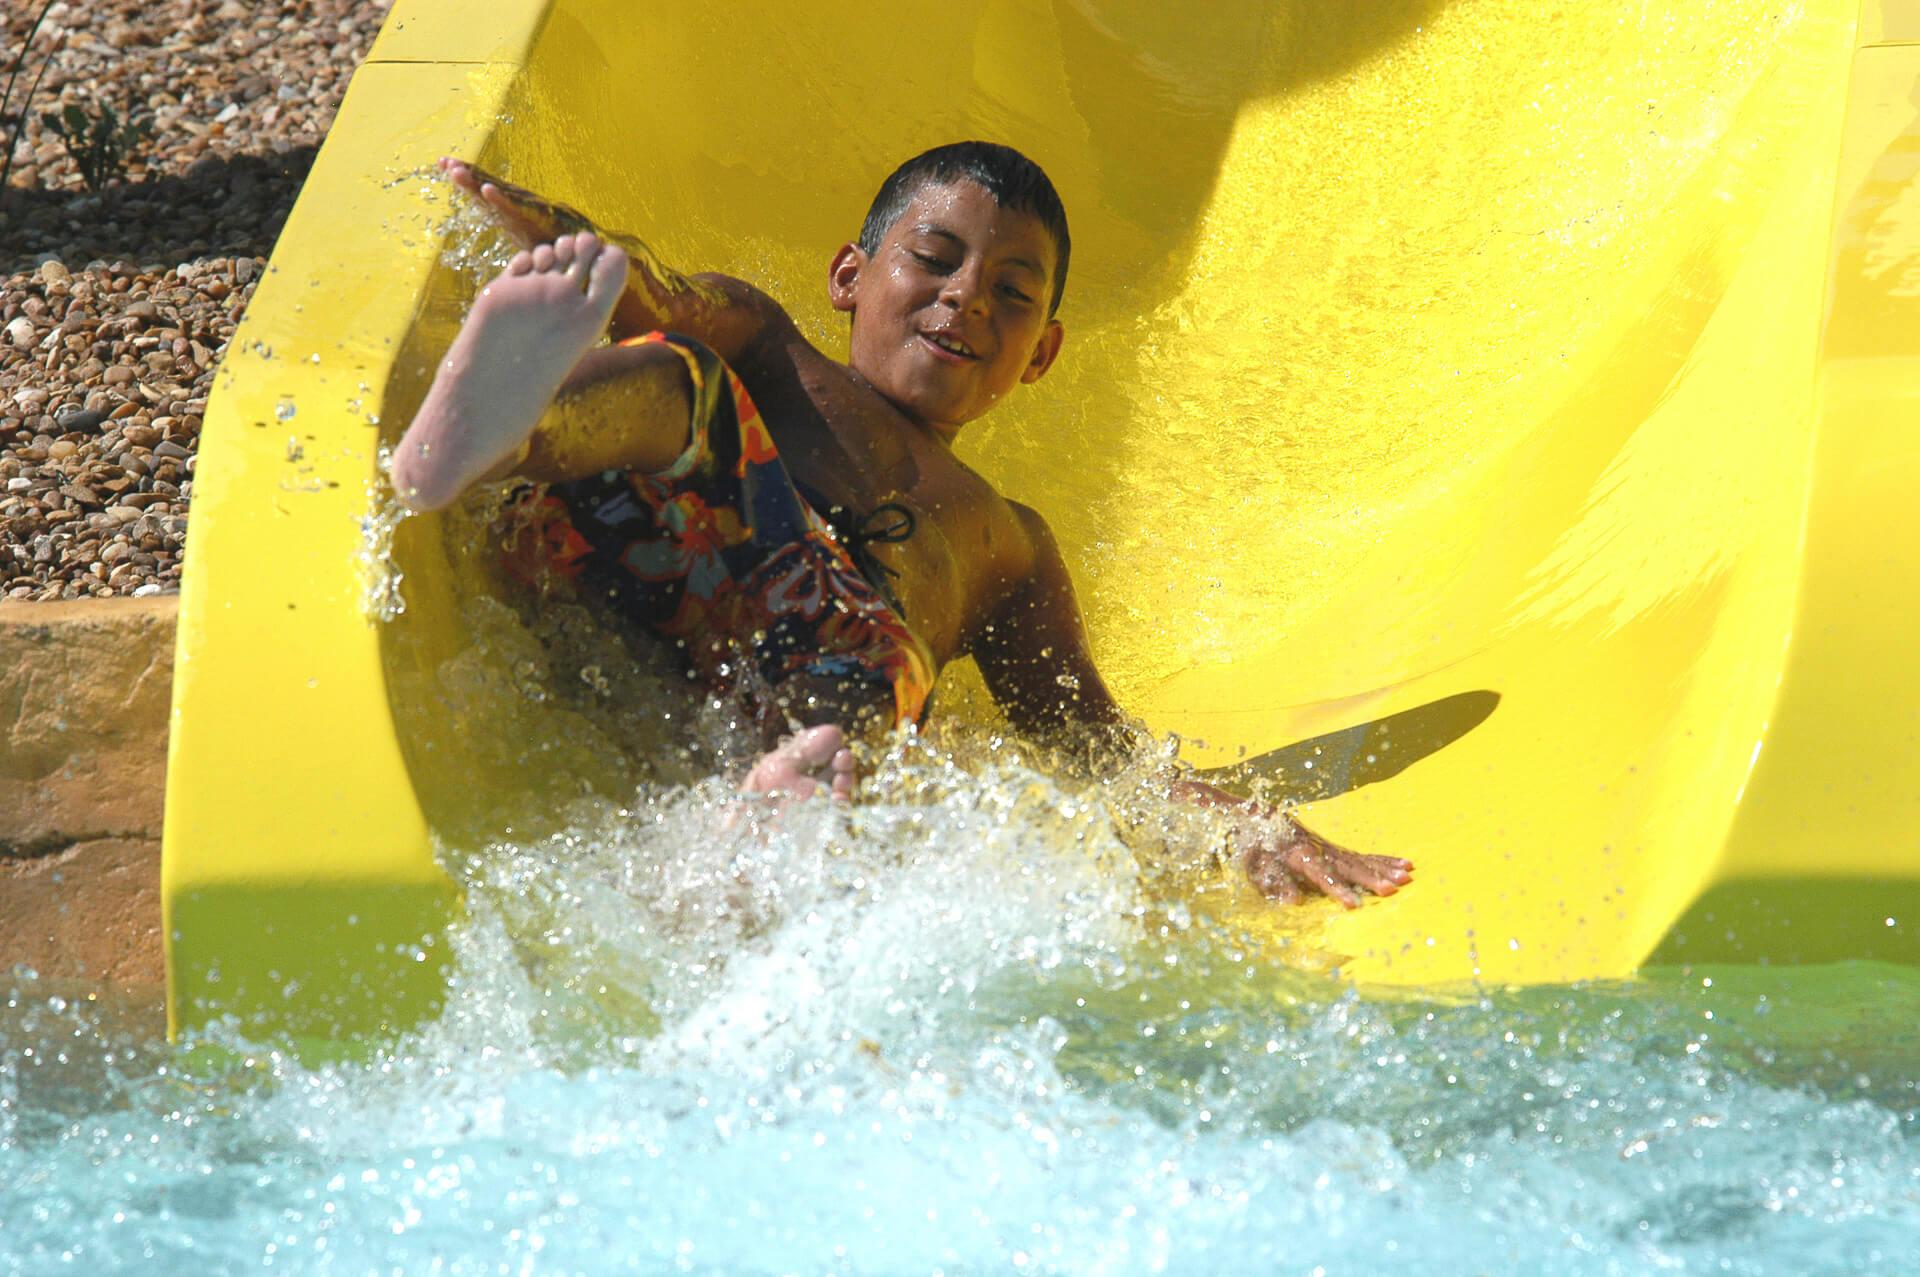 Six Flags Great America Hurricane Harbor